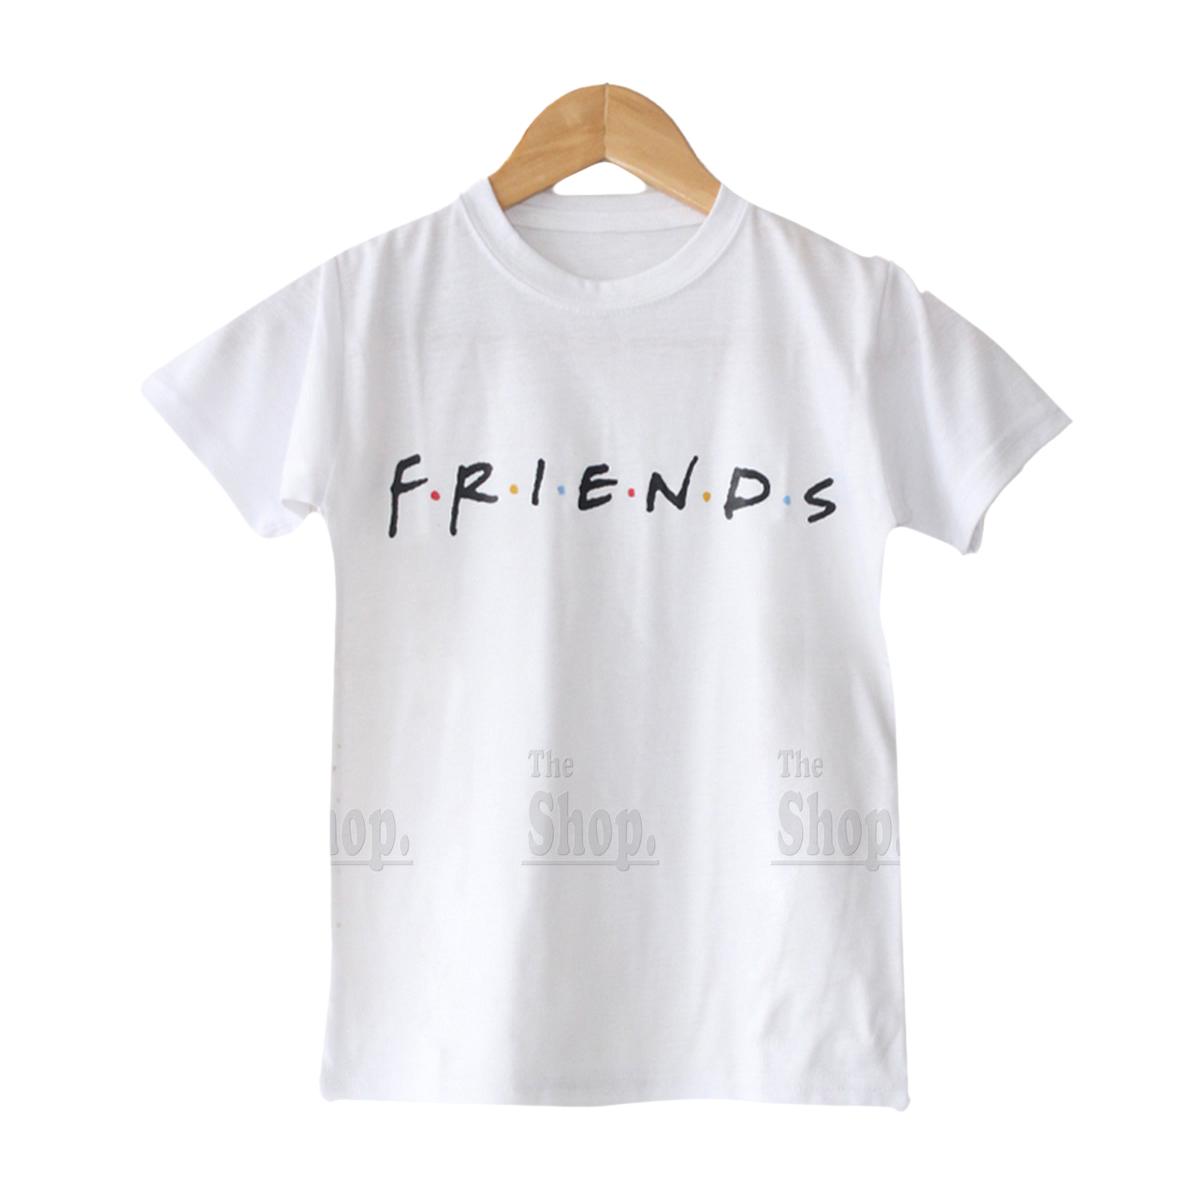 The Shop - FRIENDS T Shirt For Men & Women - NB-F1